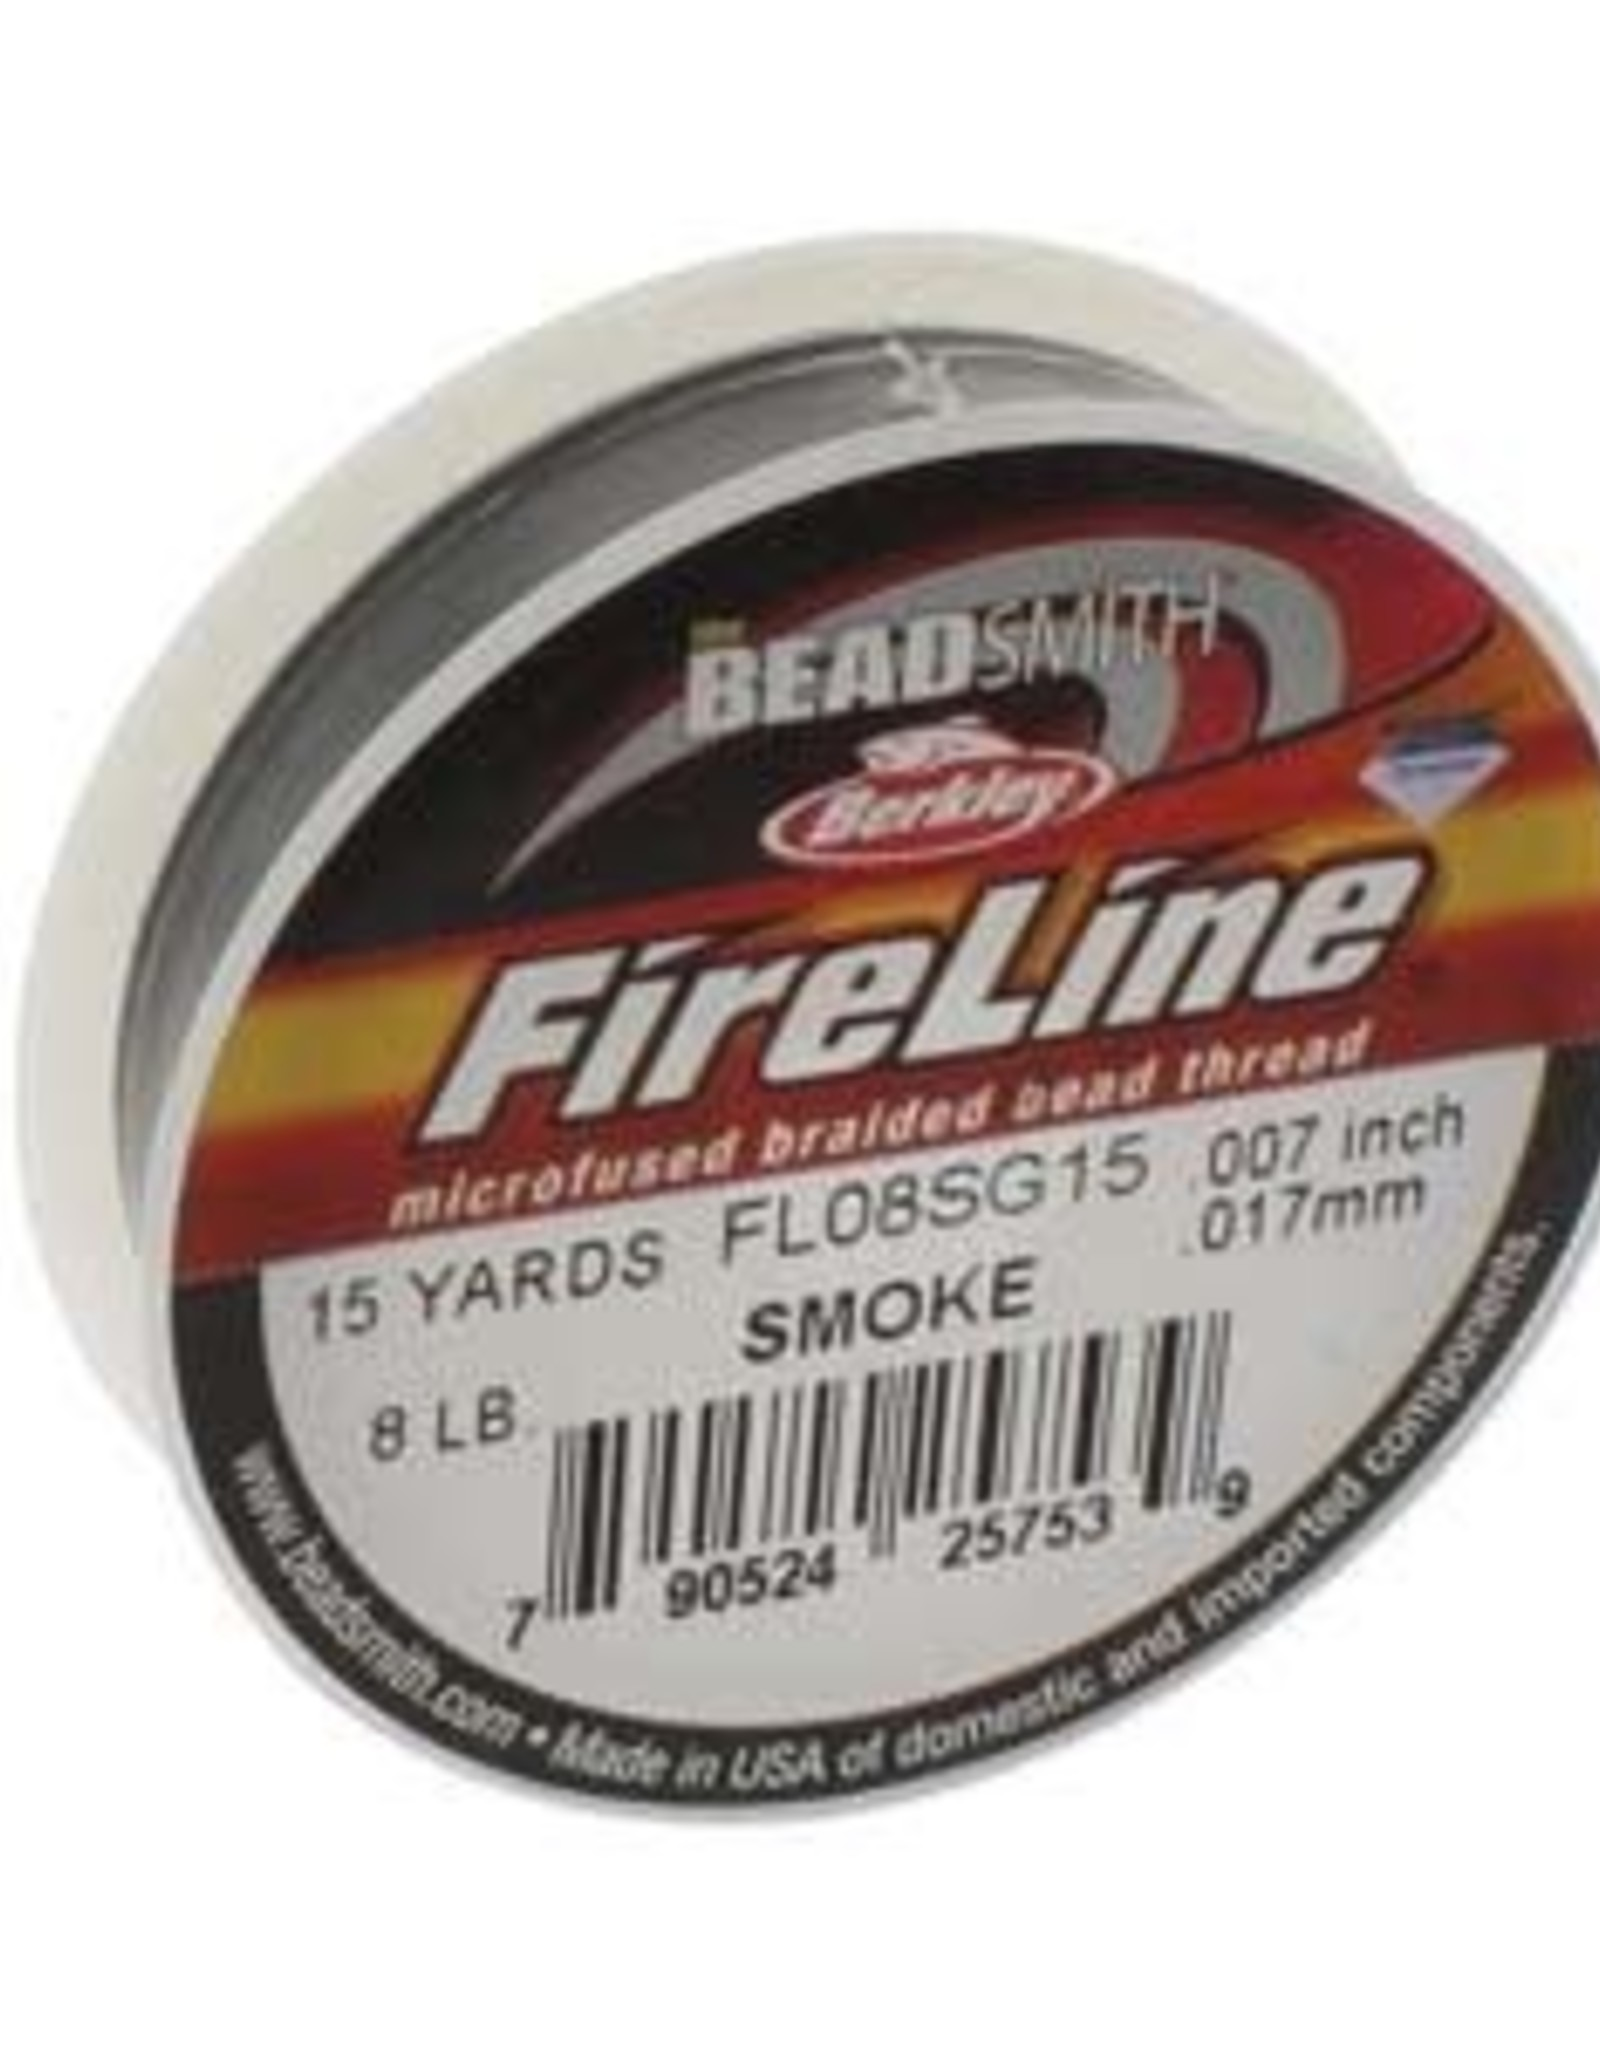 Fireline 8lb Smoke 15 yd